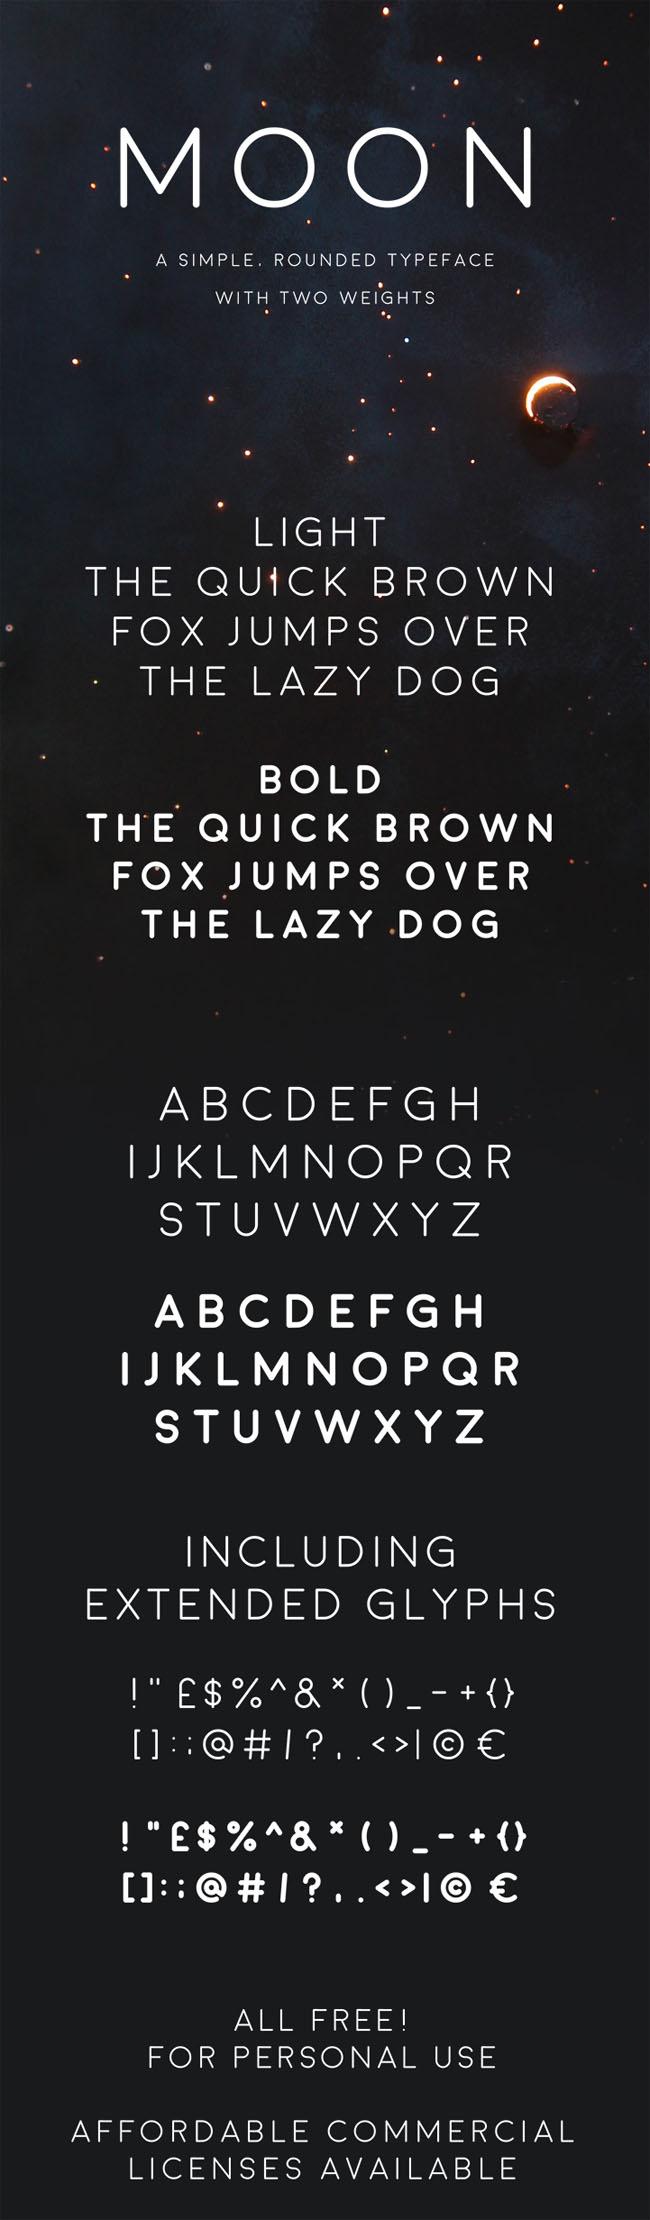 moon-font